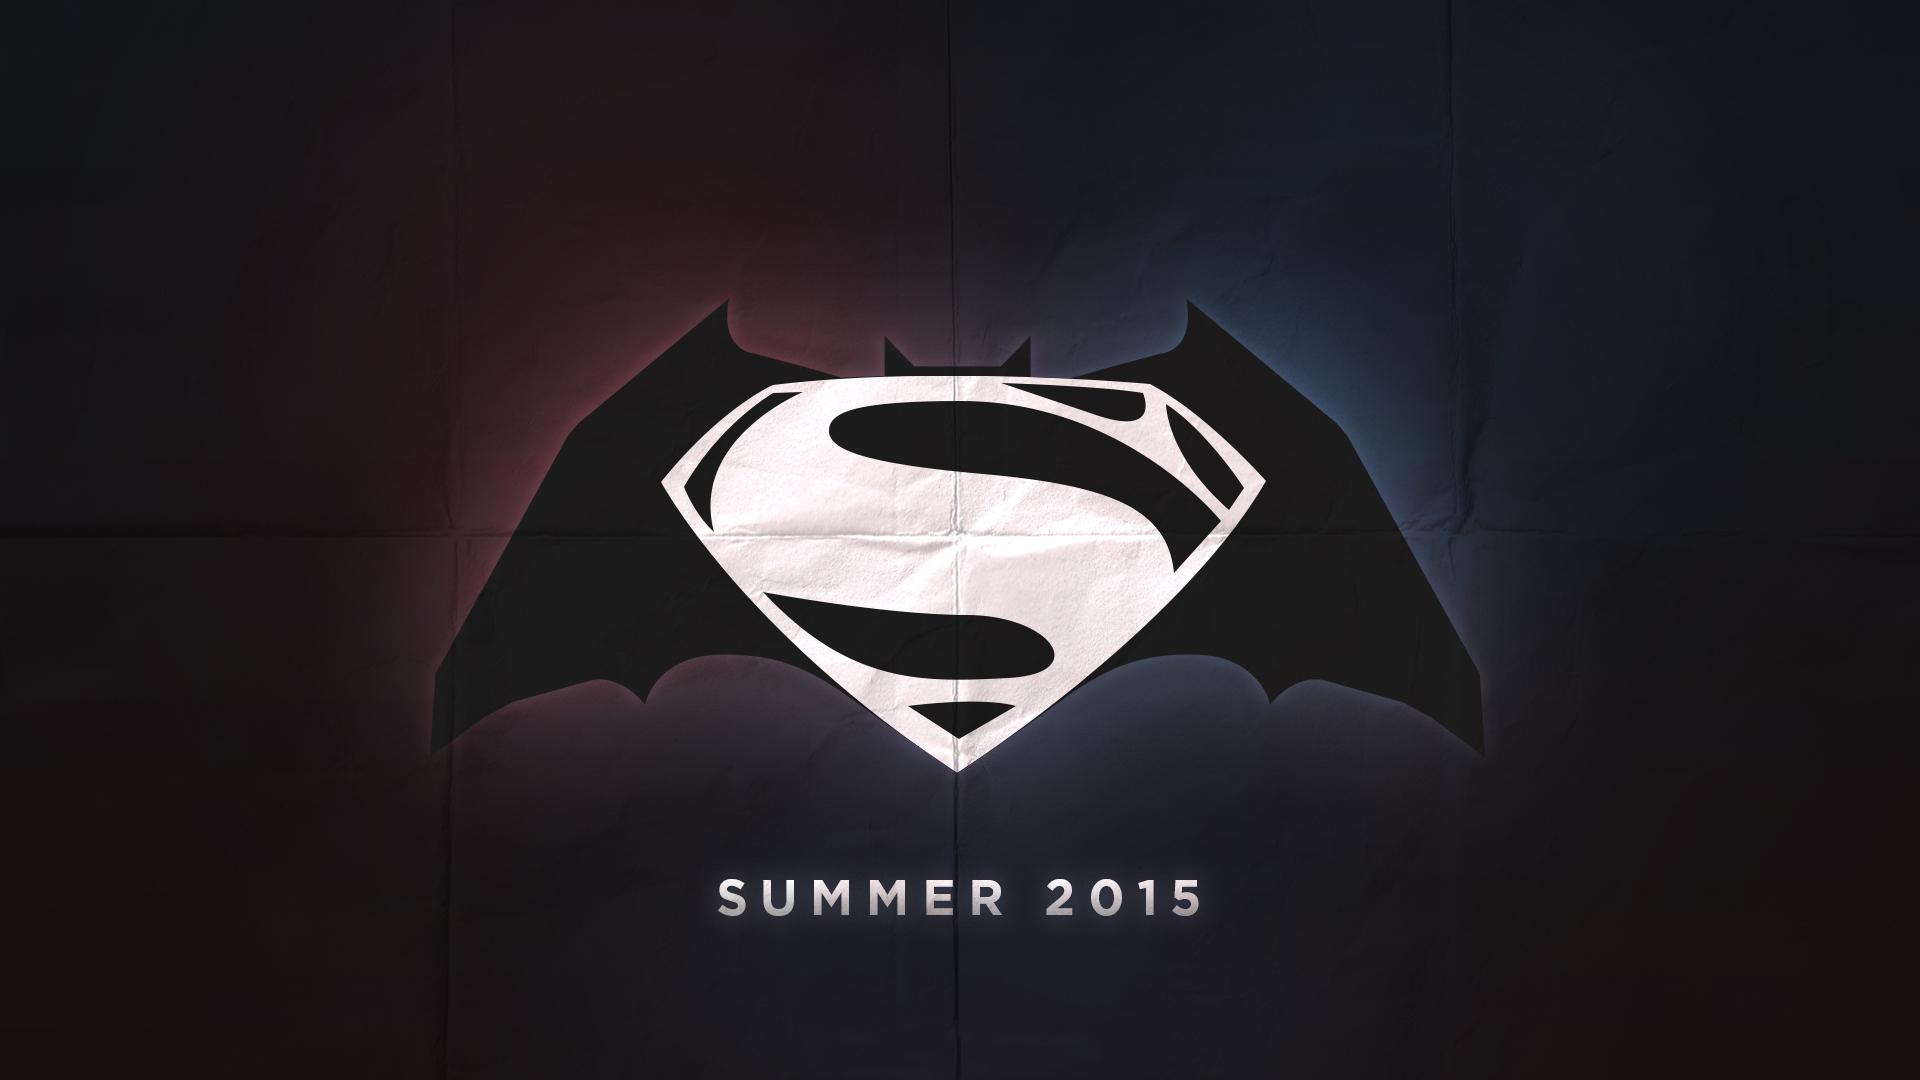 batman vs superman wallpaper #4099 - resolution 1920x1080 px